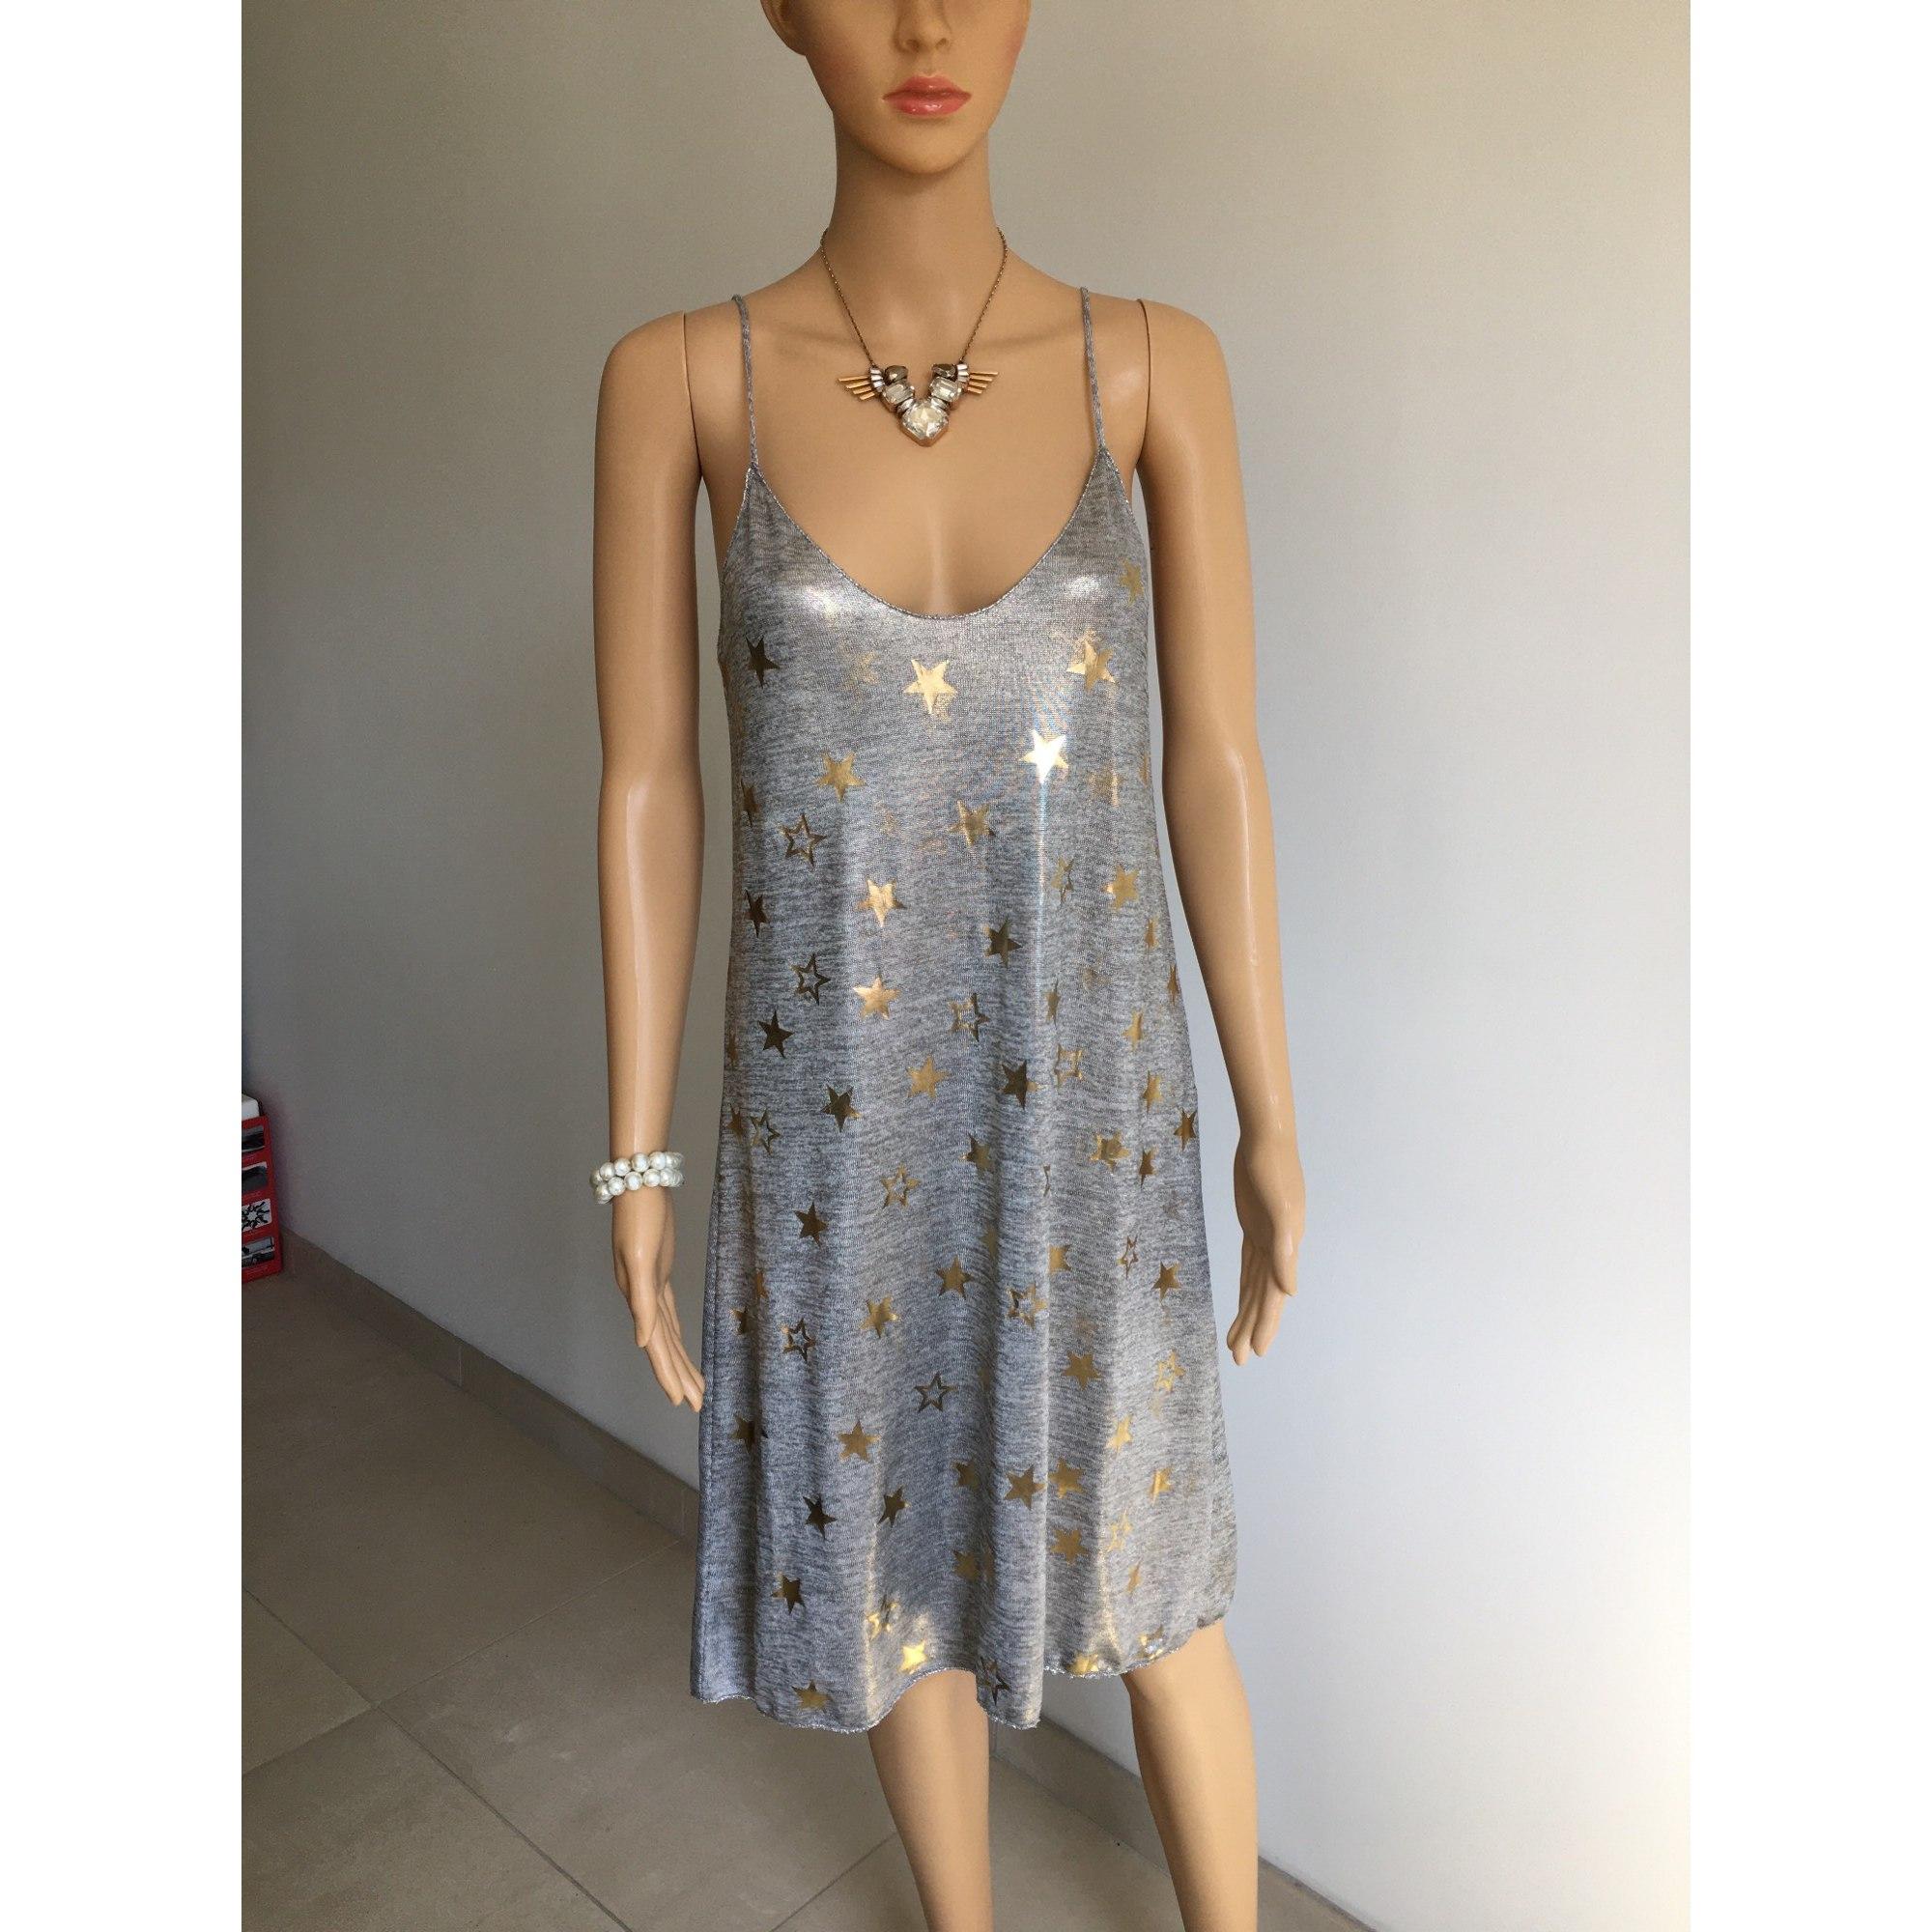 Robe mi-longue MADE IN ITALIE Argenté, acier